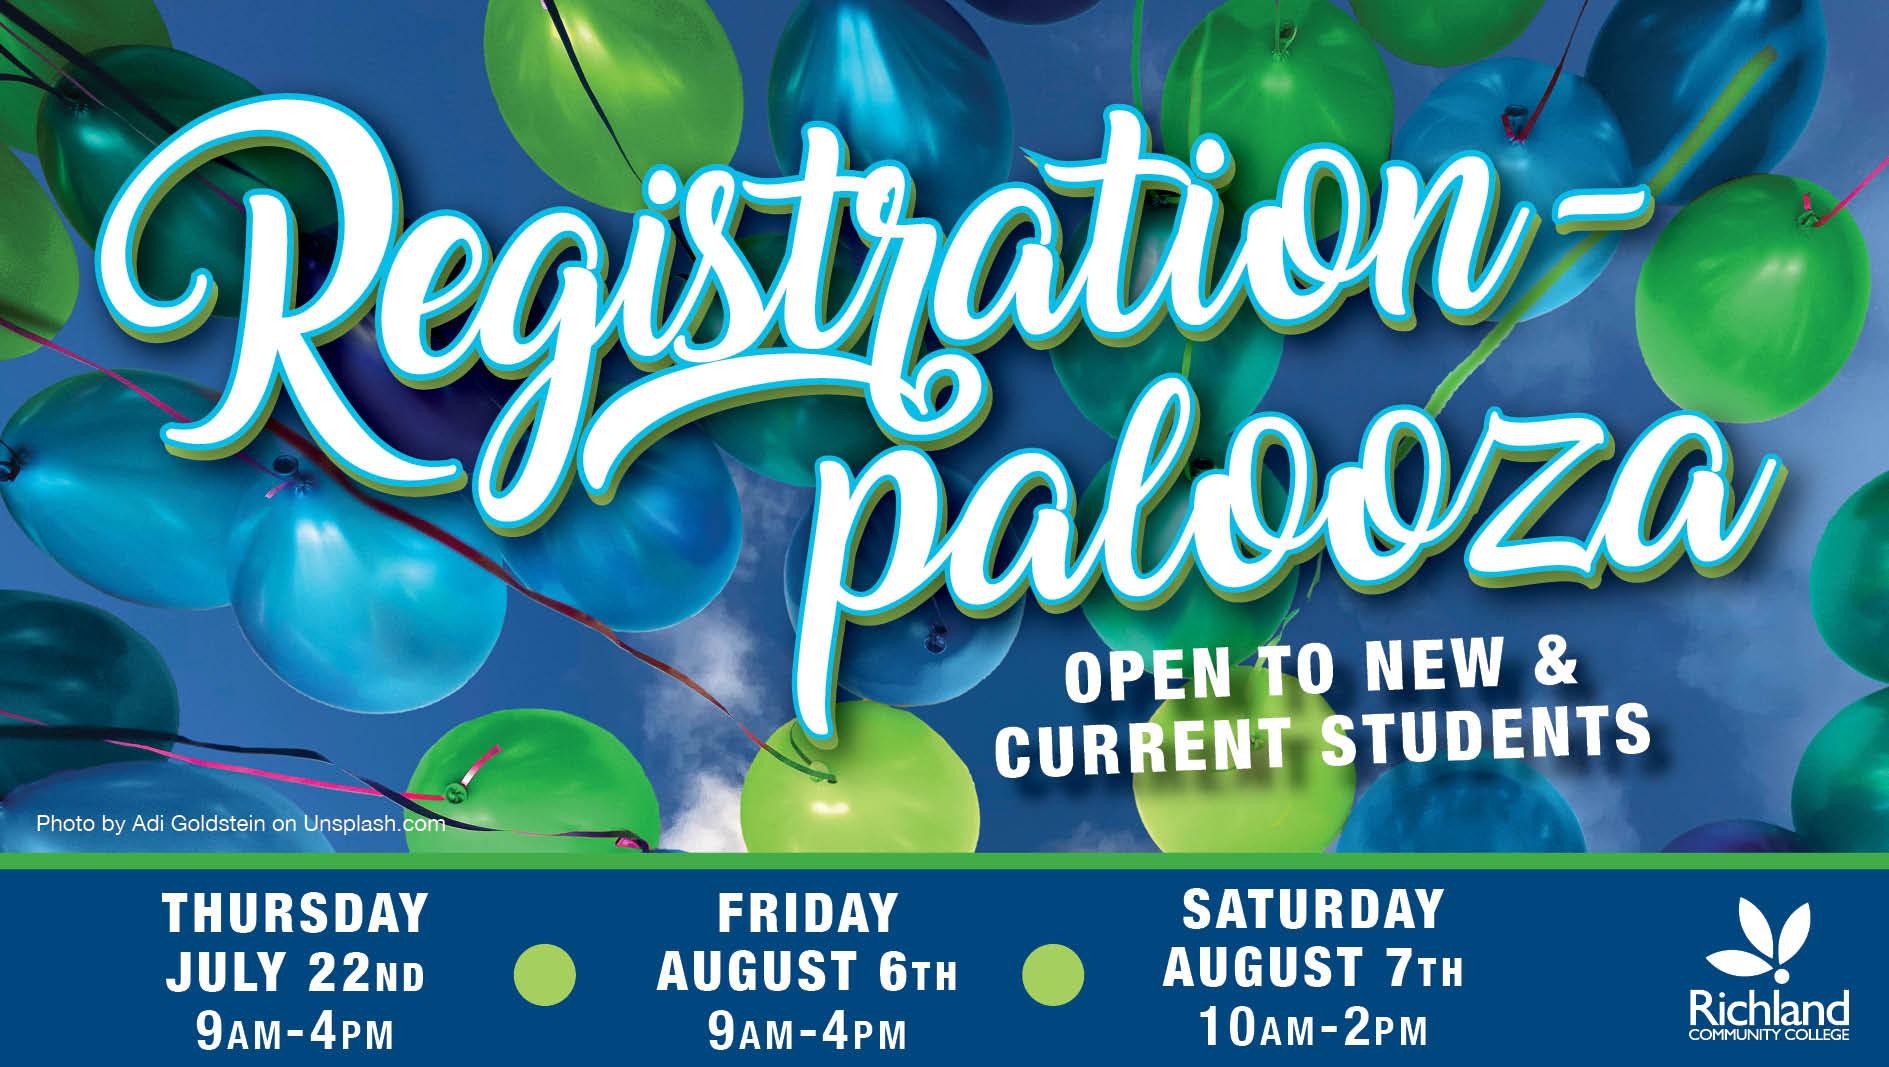 2021 Registrationpalooza Event graphic